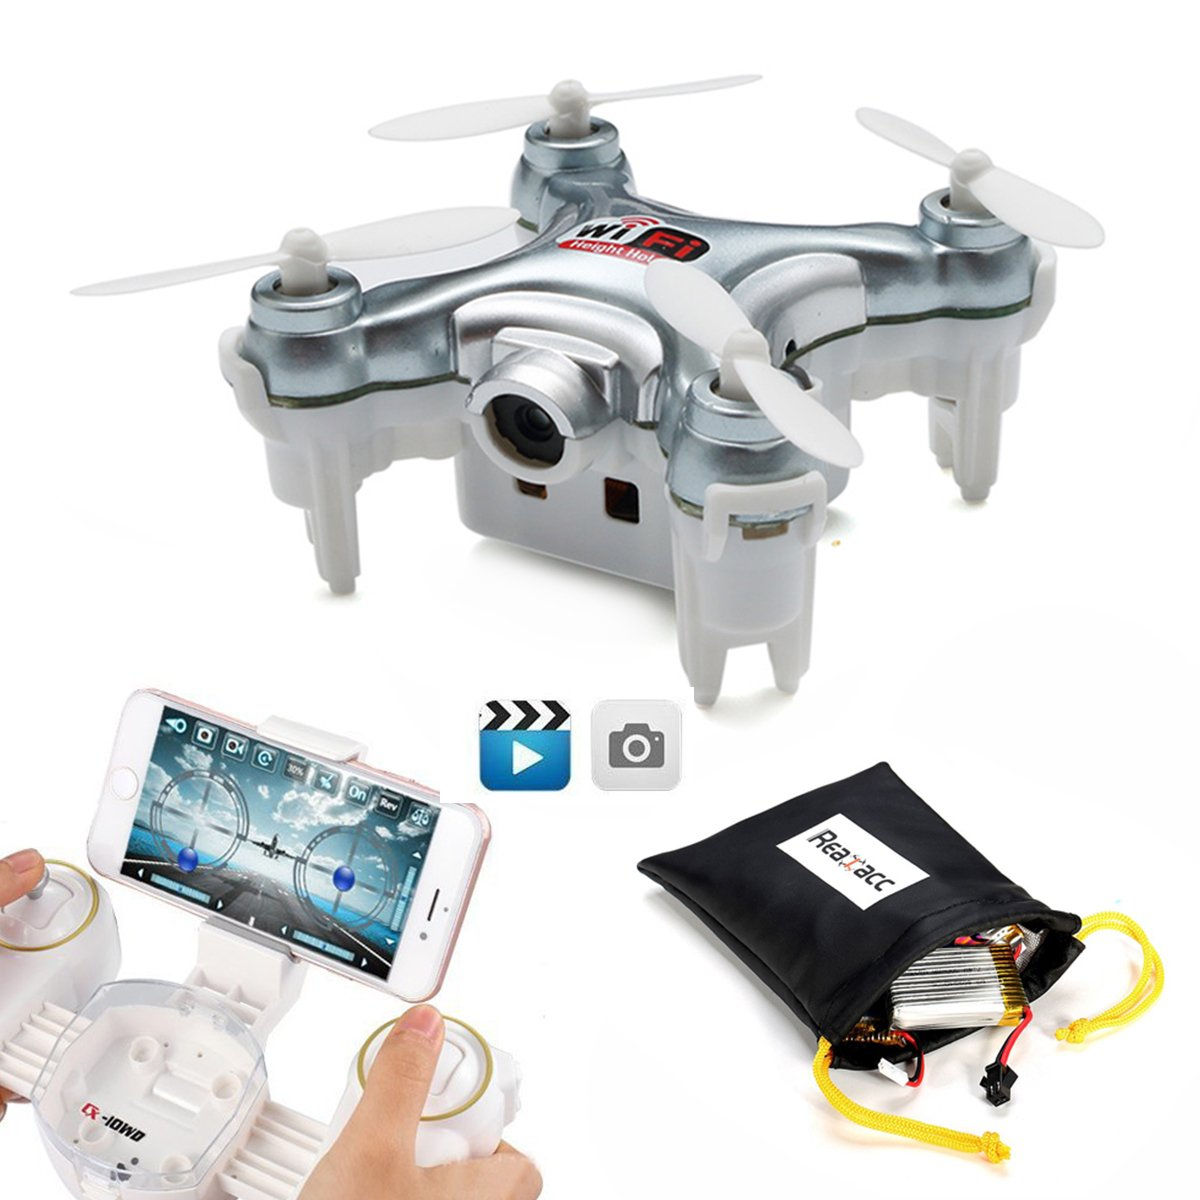 REALACC Cheerson CX WD TX Mini Wifi FPV Cuadricóptero Con Cámara High